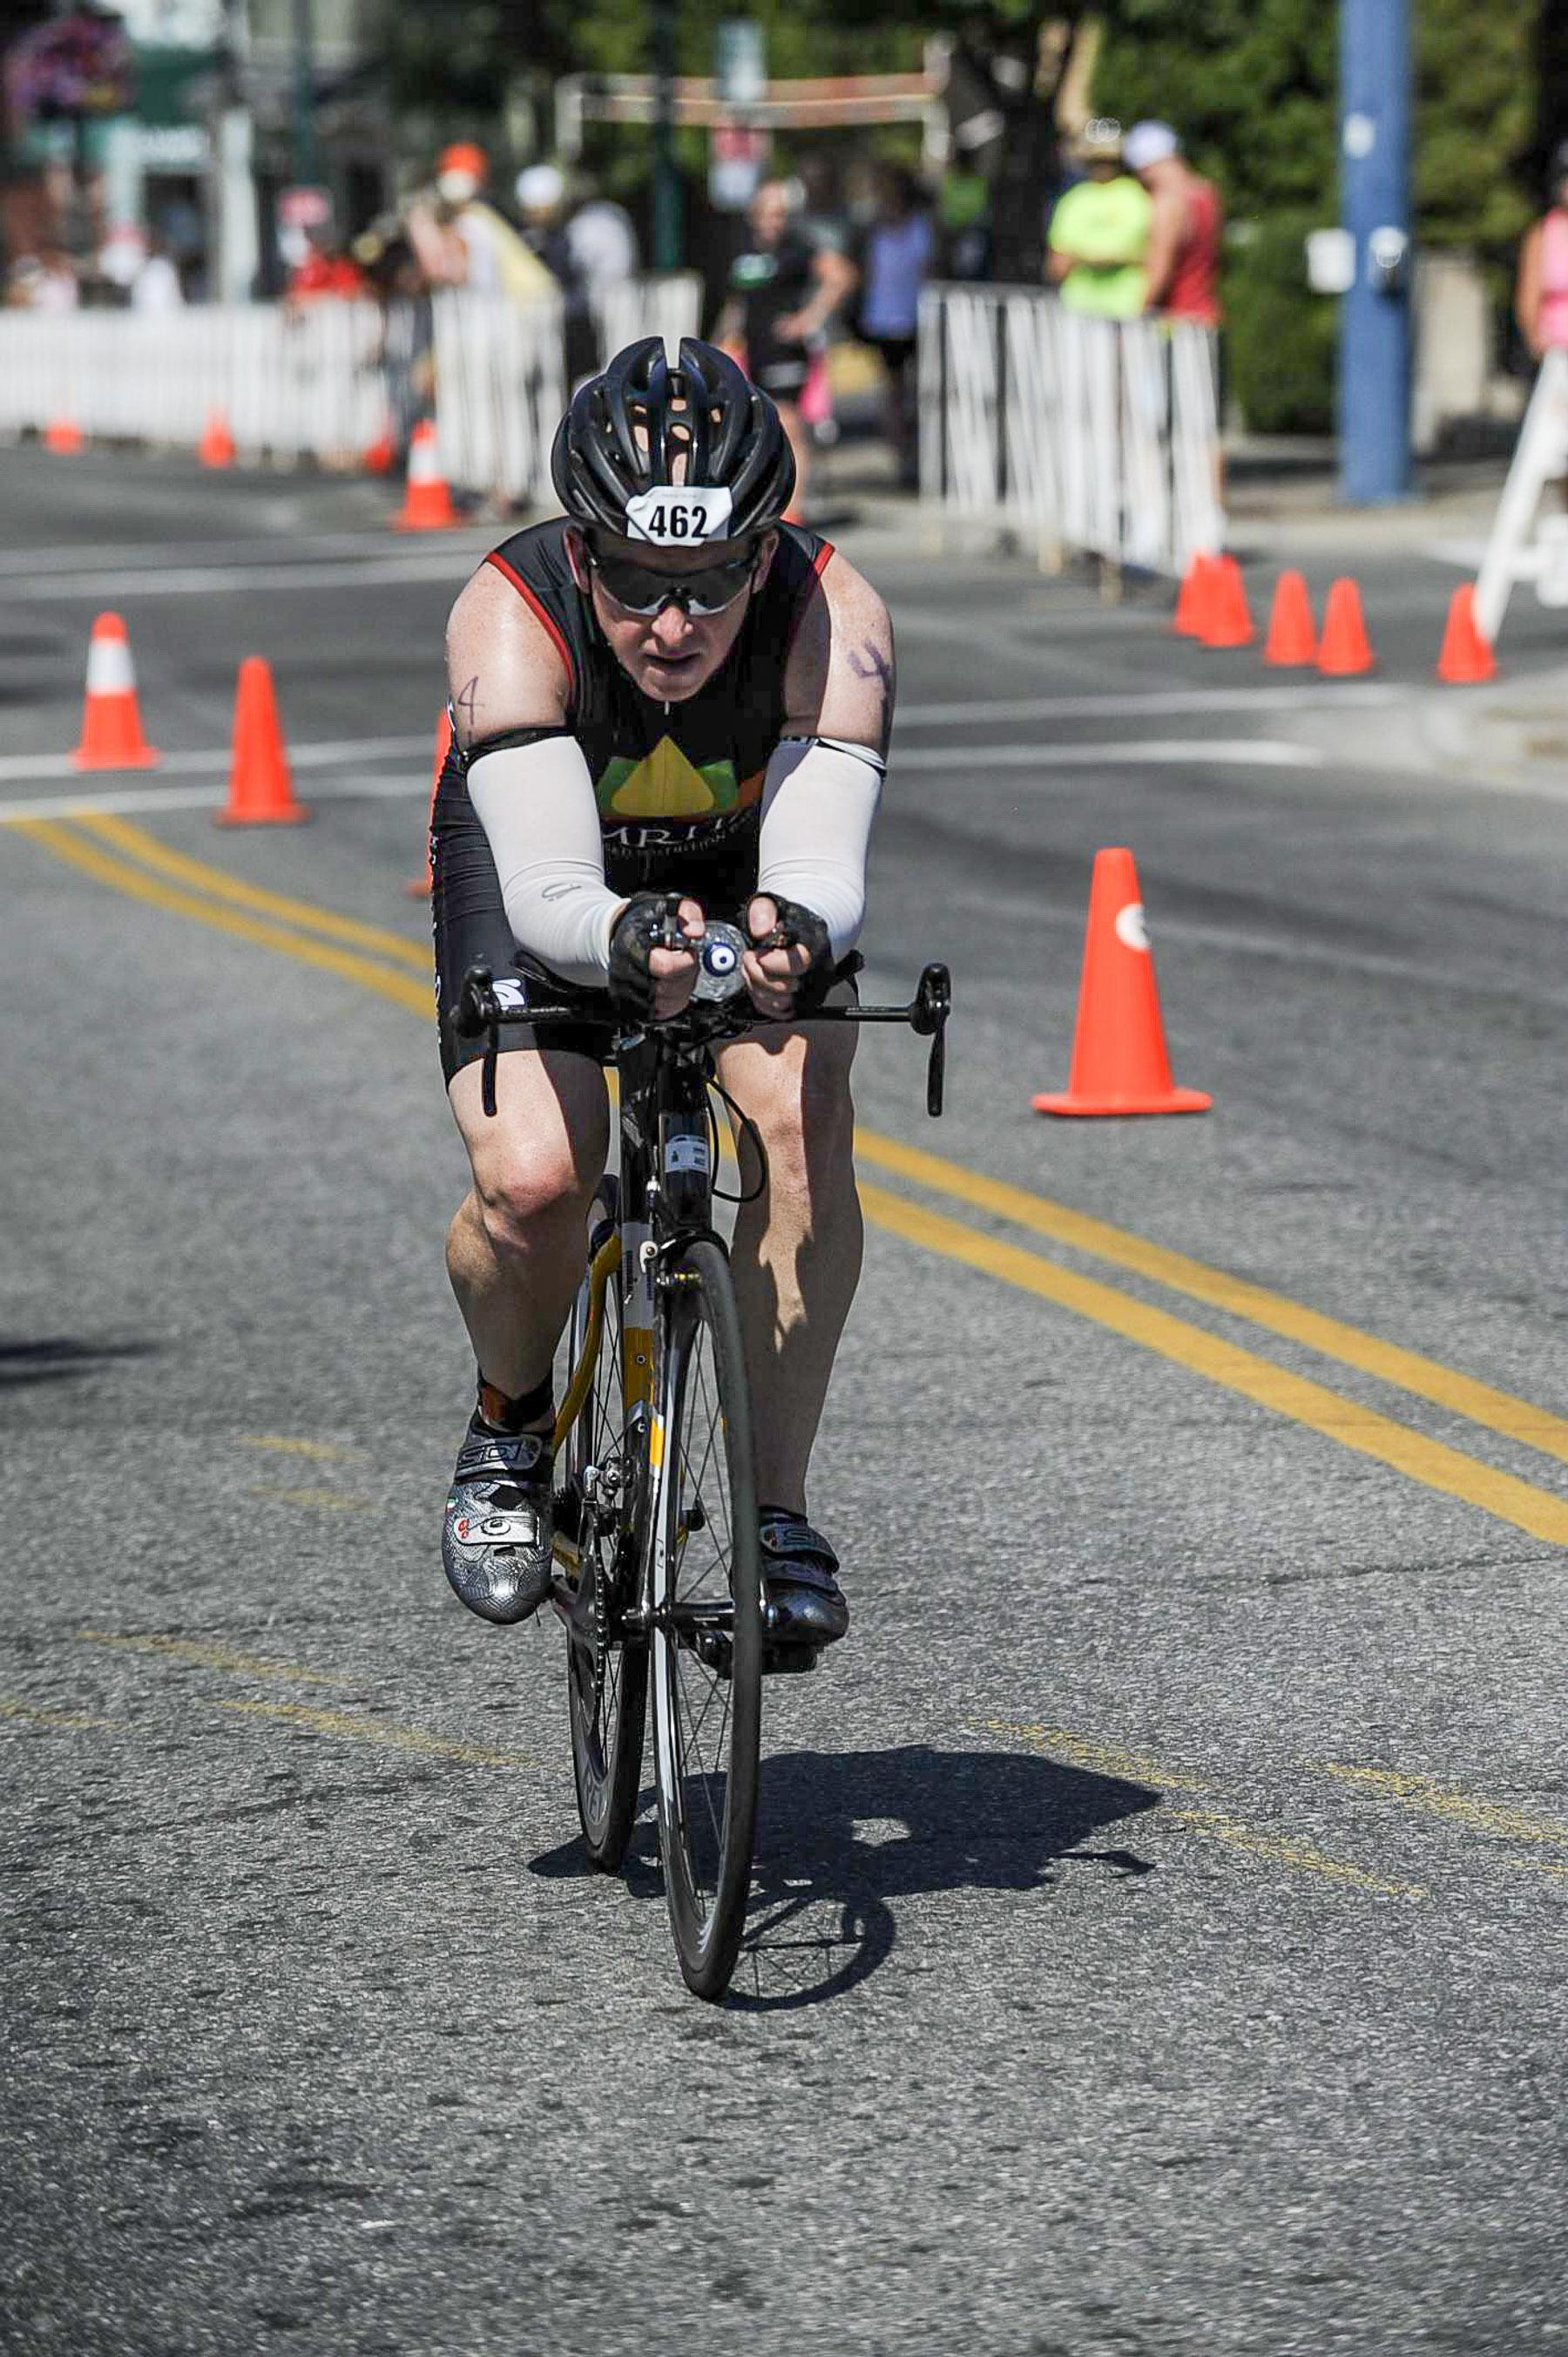 Endurance Sports, FinisherPix, Full, Idaho, Ironman, Race, Sports, Triathlon, United States, coeur d'alene, imcda, multisport, tri